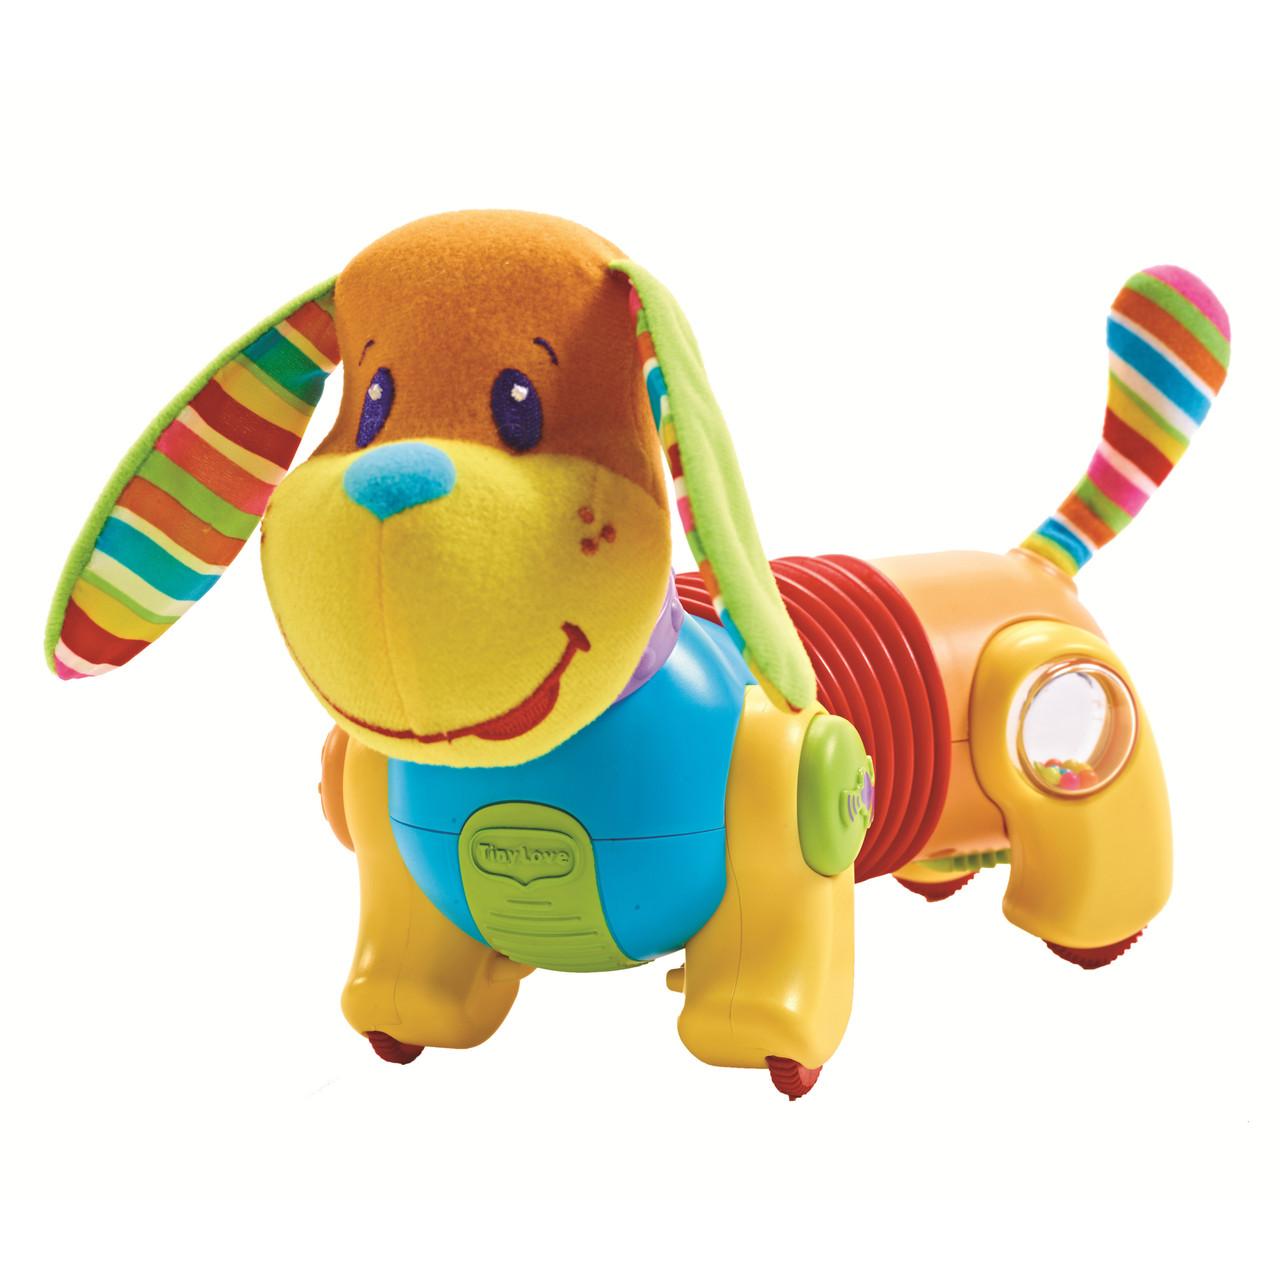 Интерактивная игрушка «Tiny Love» (1502406830) щенок Фред